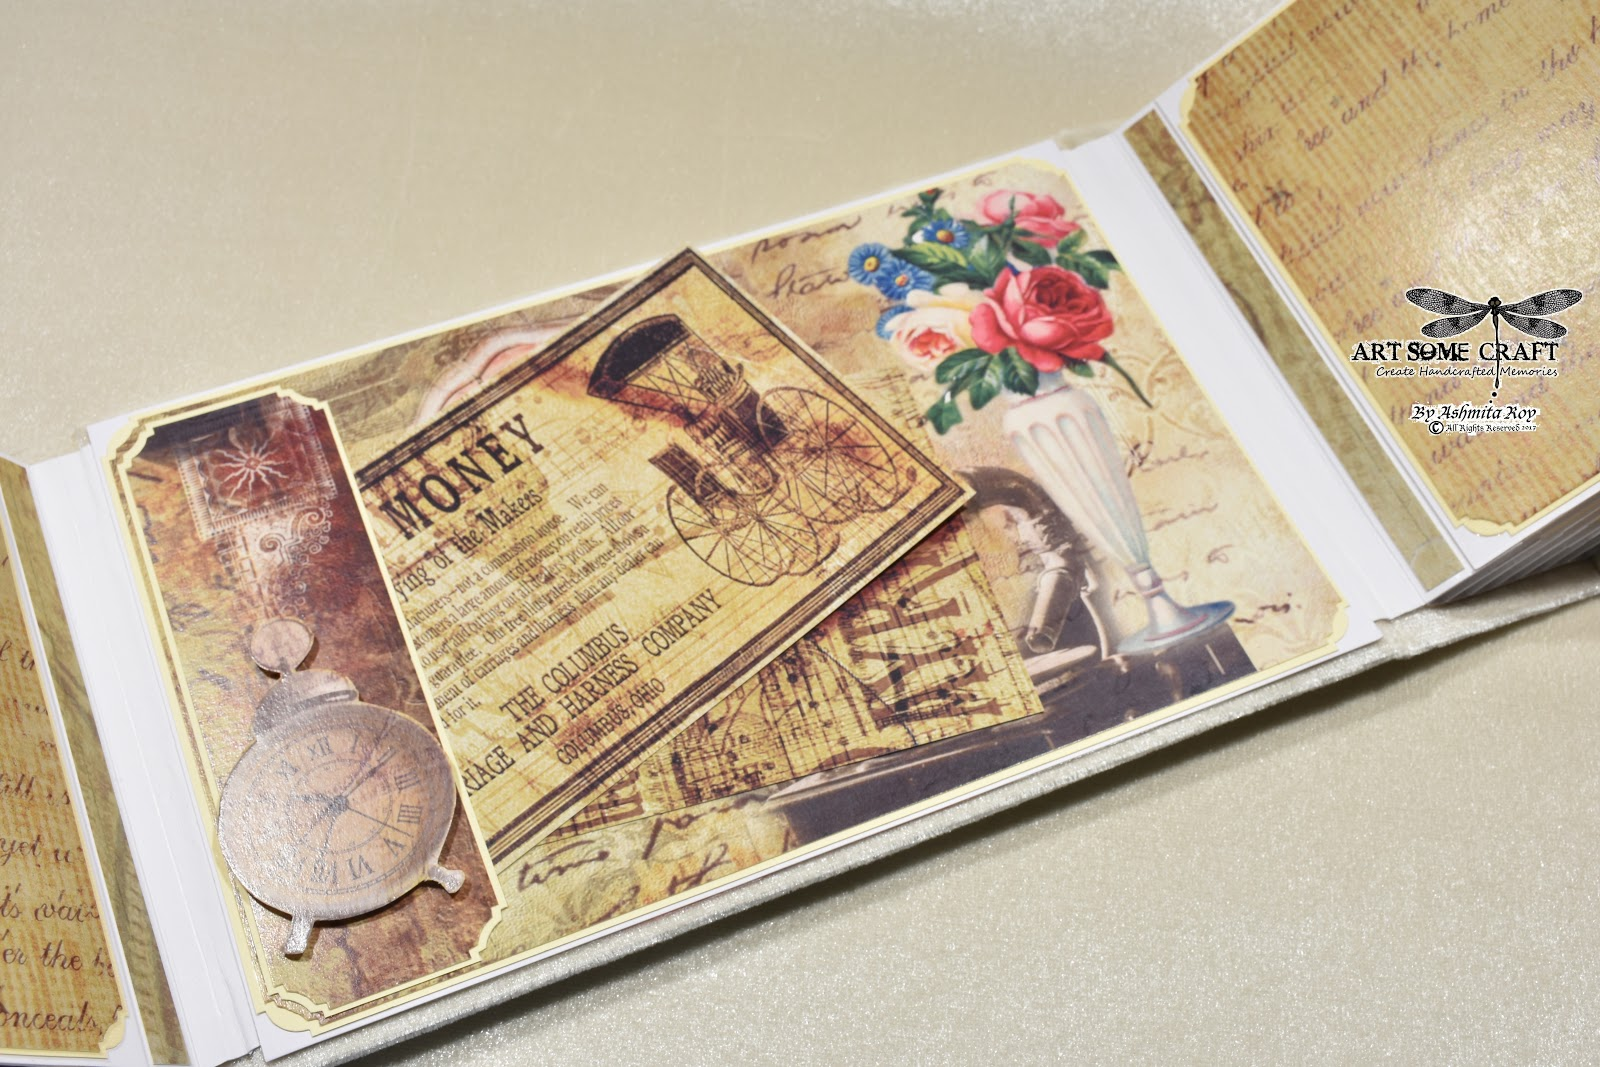 Art some craft: Gatefold Shabby chic Mother's Day Mini album